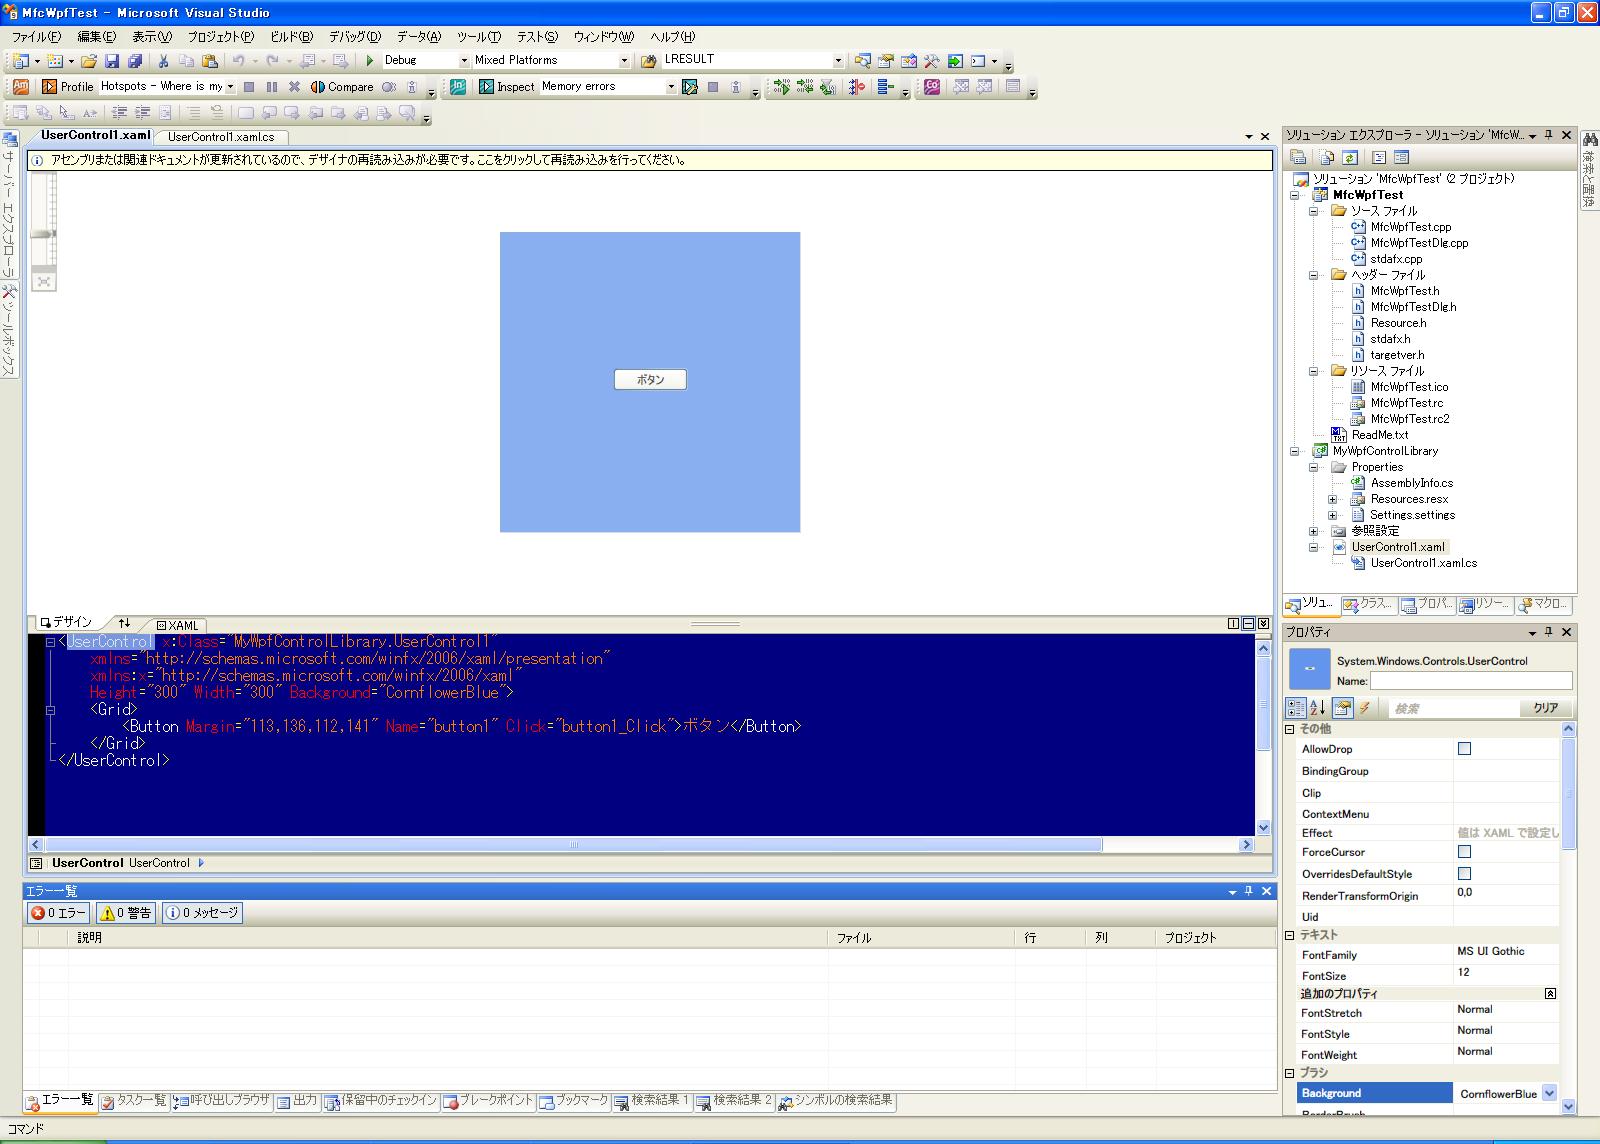 https://sygh-jp.github.io/content_hosting/my_program_ss/Wpf_Designer_Error_ss_2010_05_31b.png